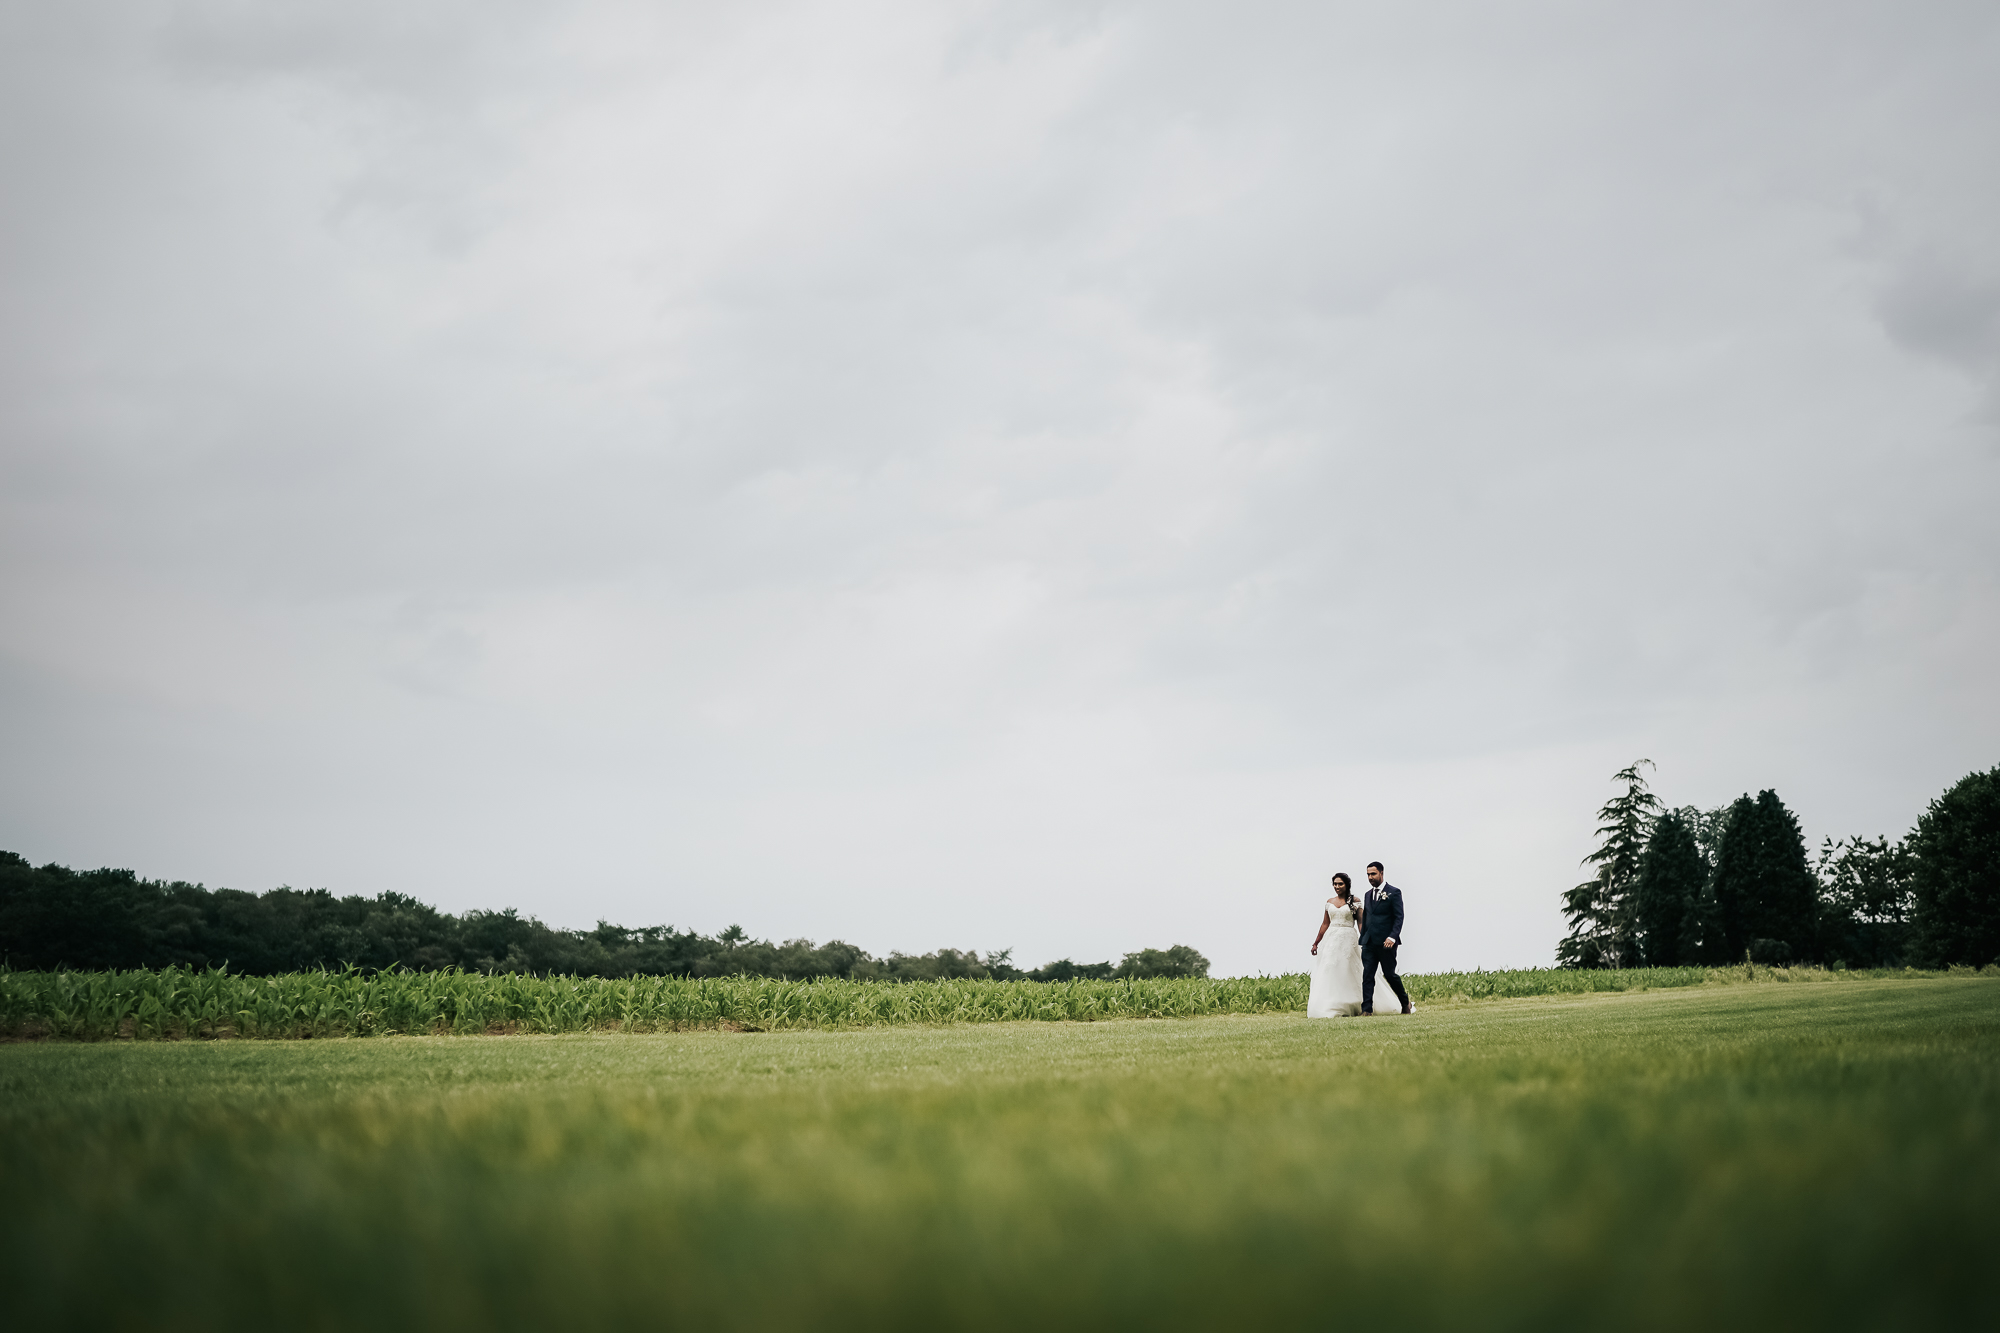 Alcumlow Hall Farm Indian Wedding Photographer (37 of 44).jpg